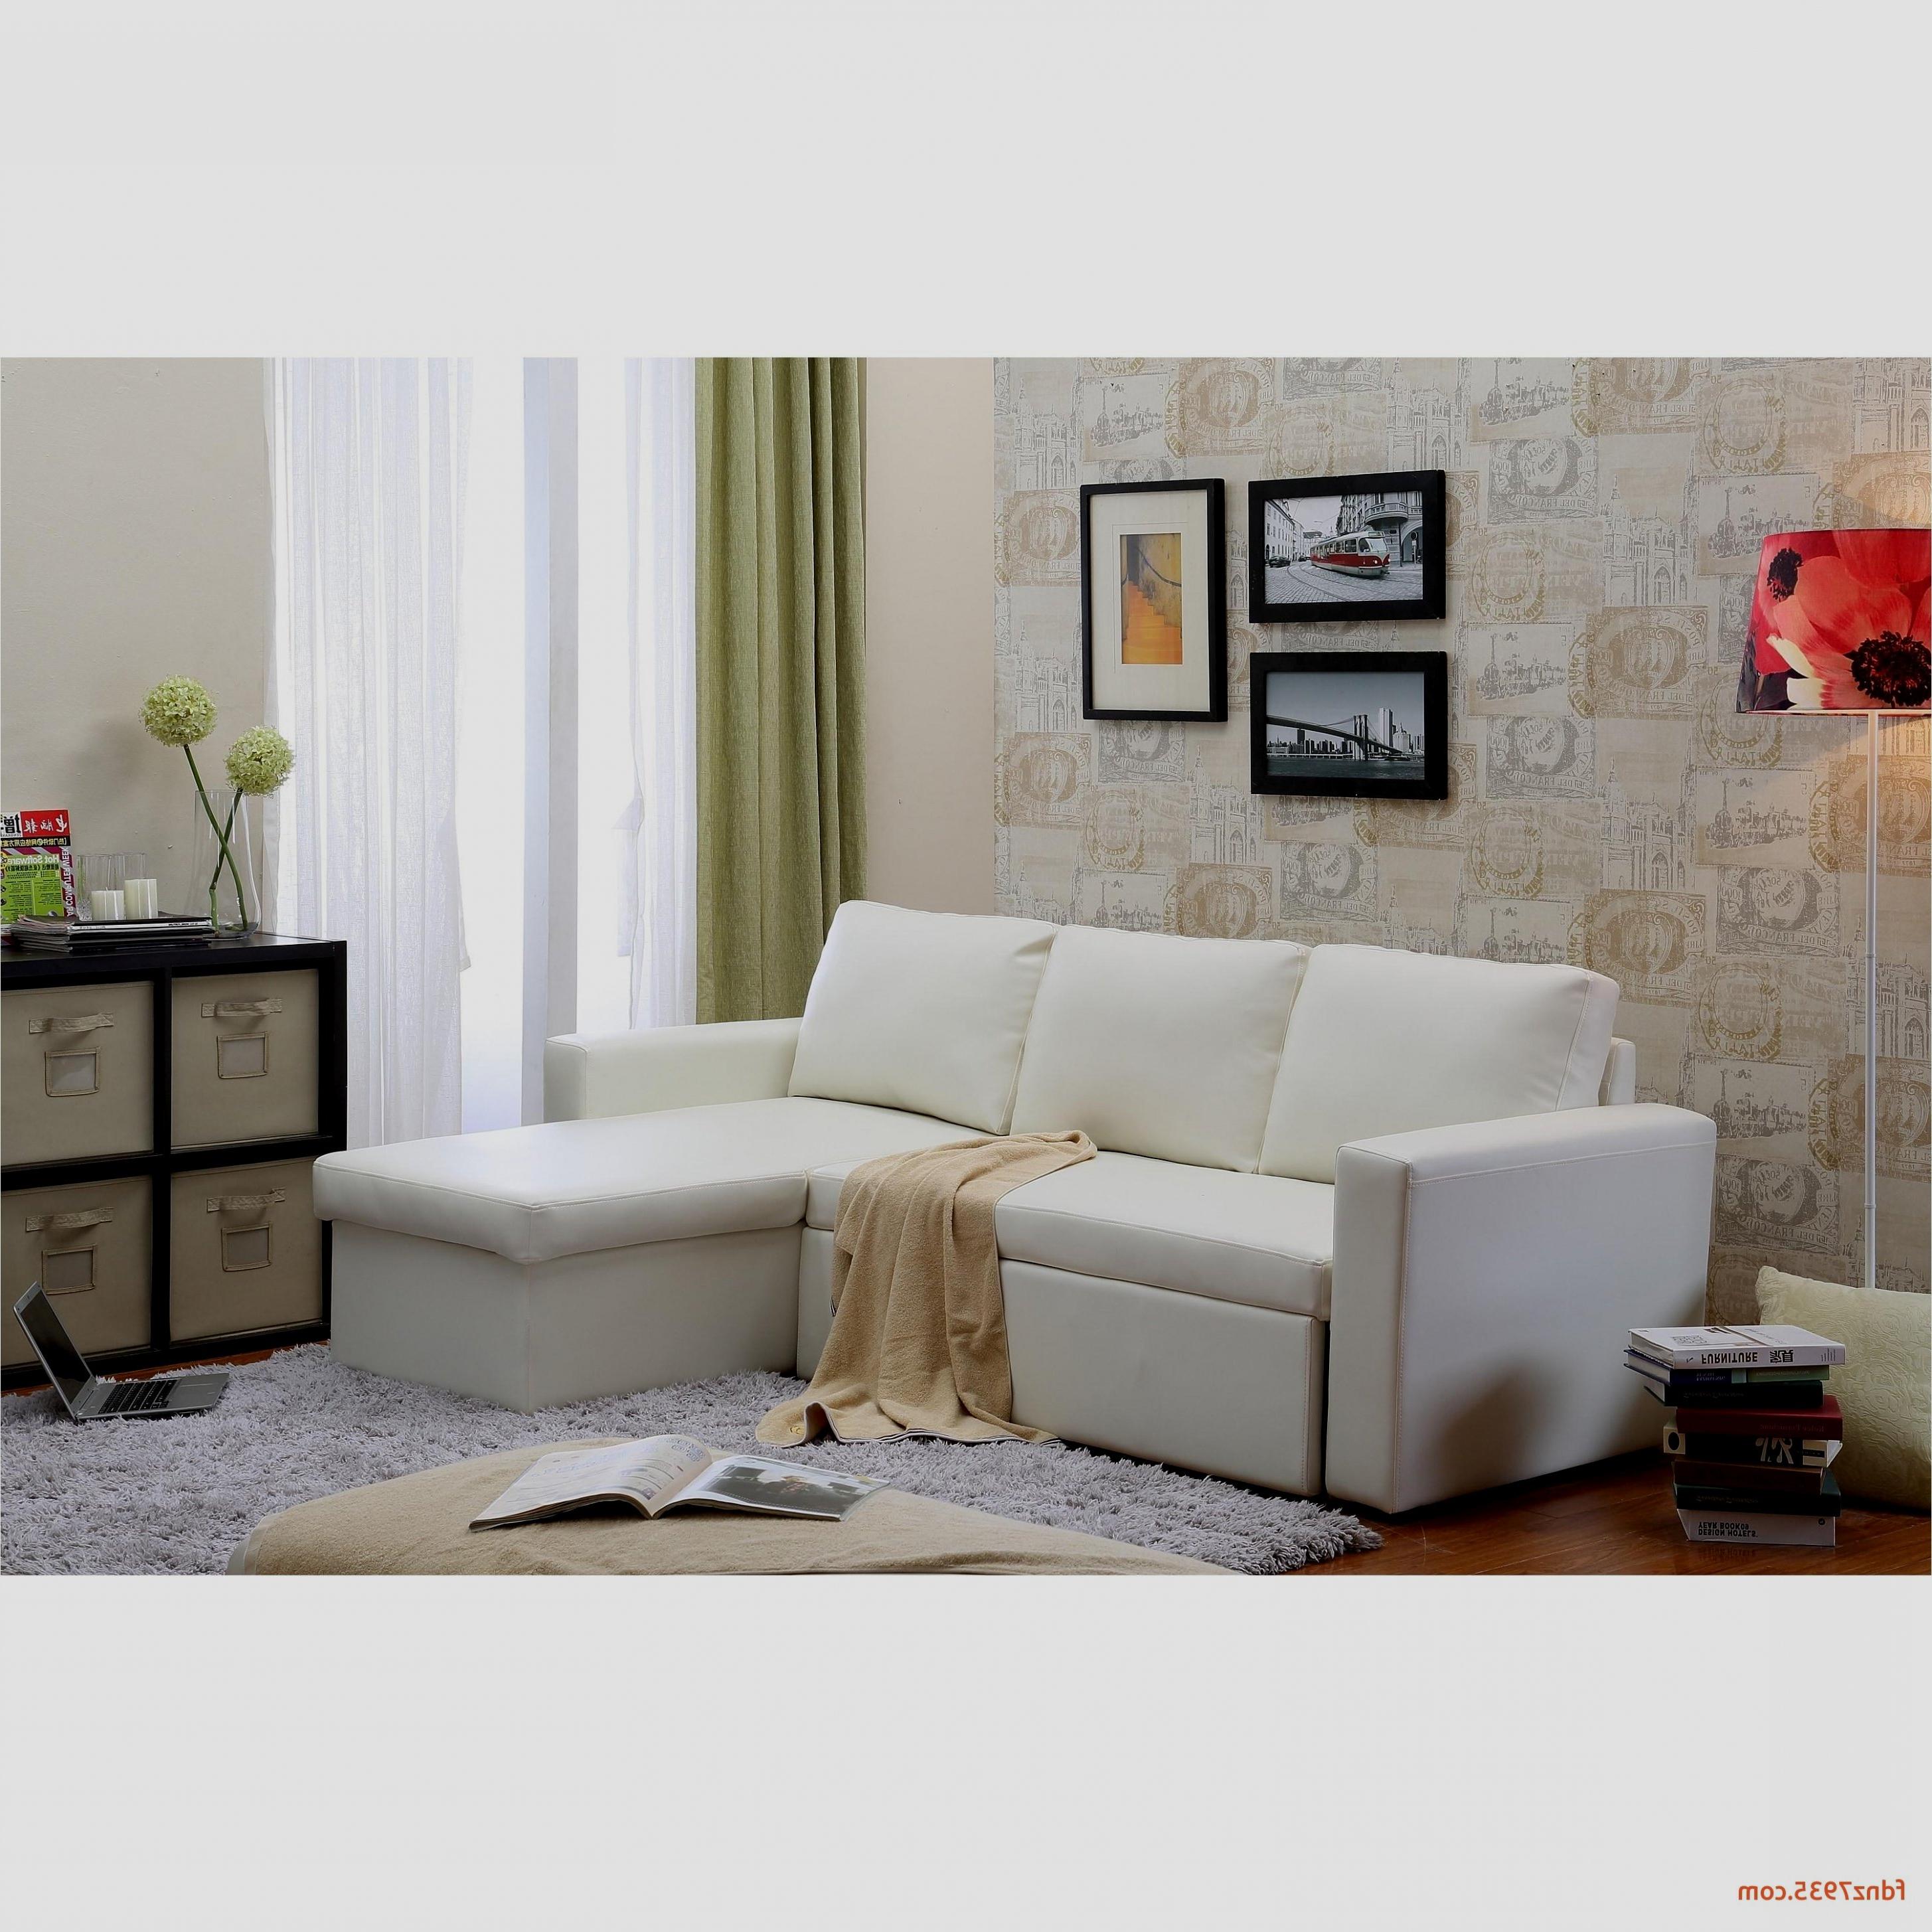 Sillon Relax Conforama Dddy Sillon Relax Conforama Hermoso sofas and Loveseats Fresh sofa